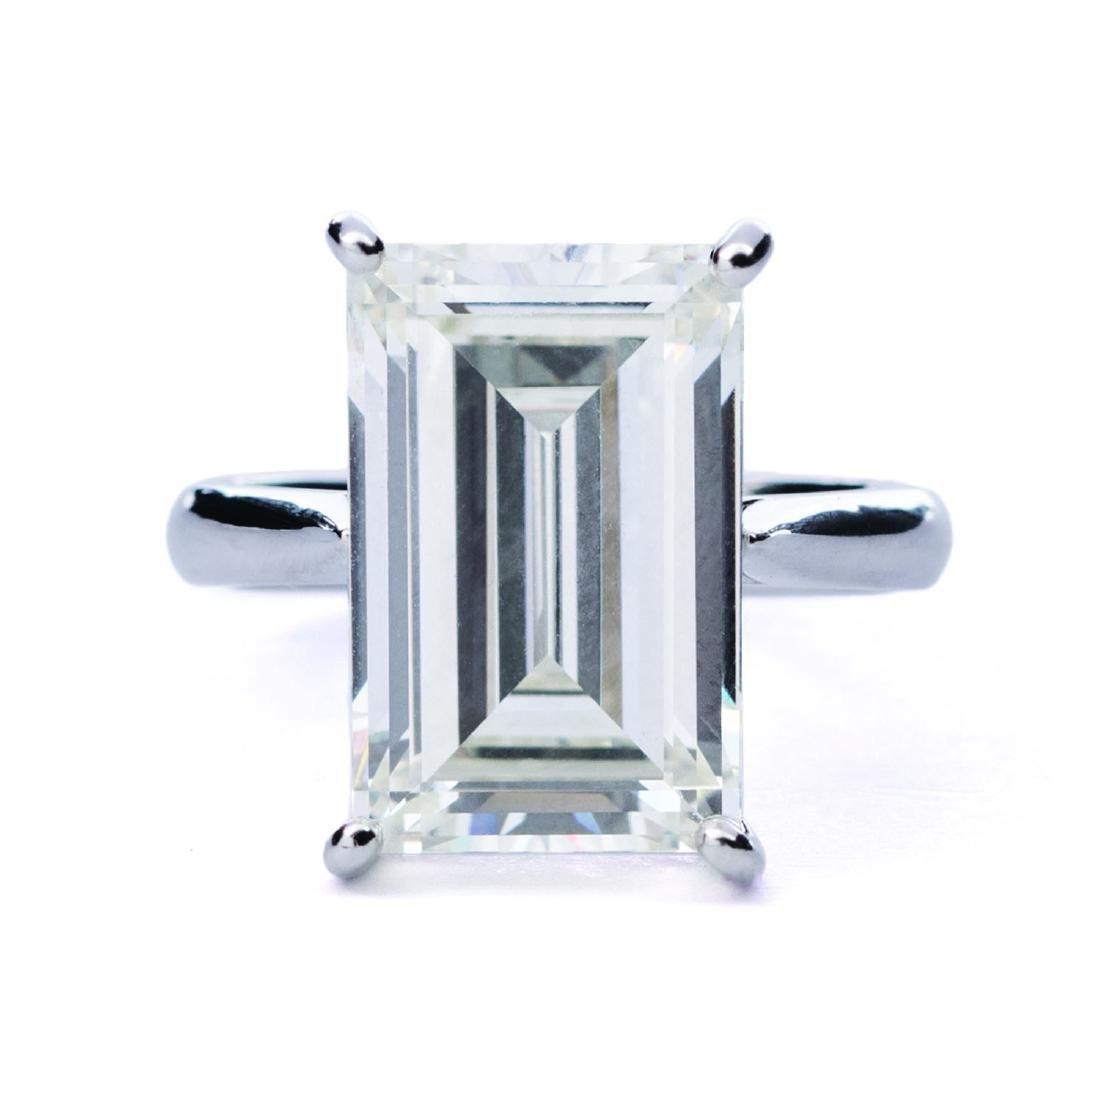 An impressive GIA-certified 9.33 ct emerald cut diamond